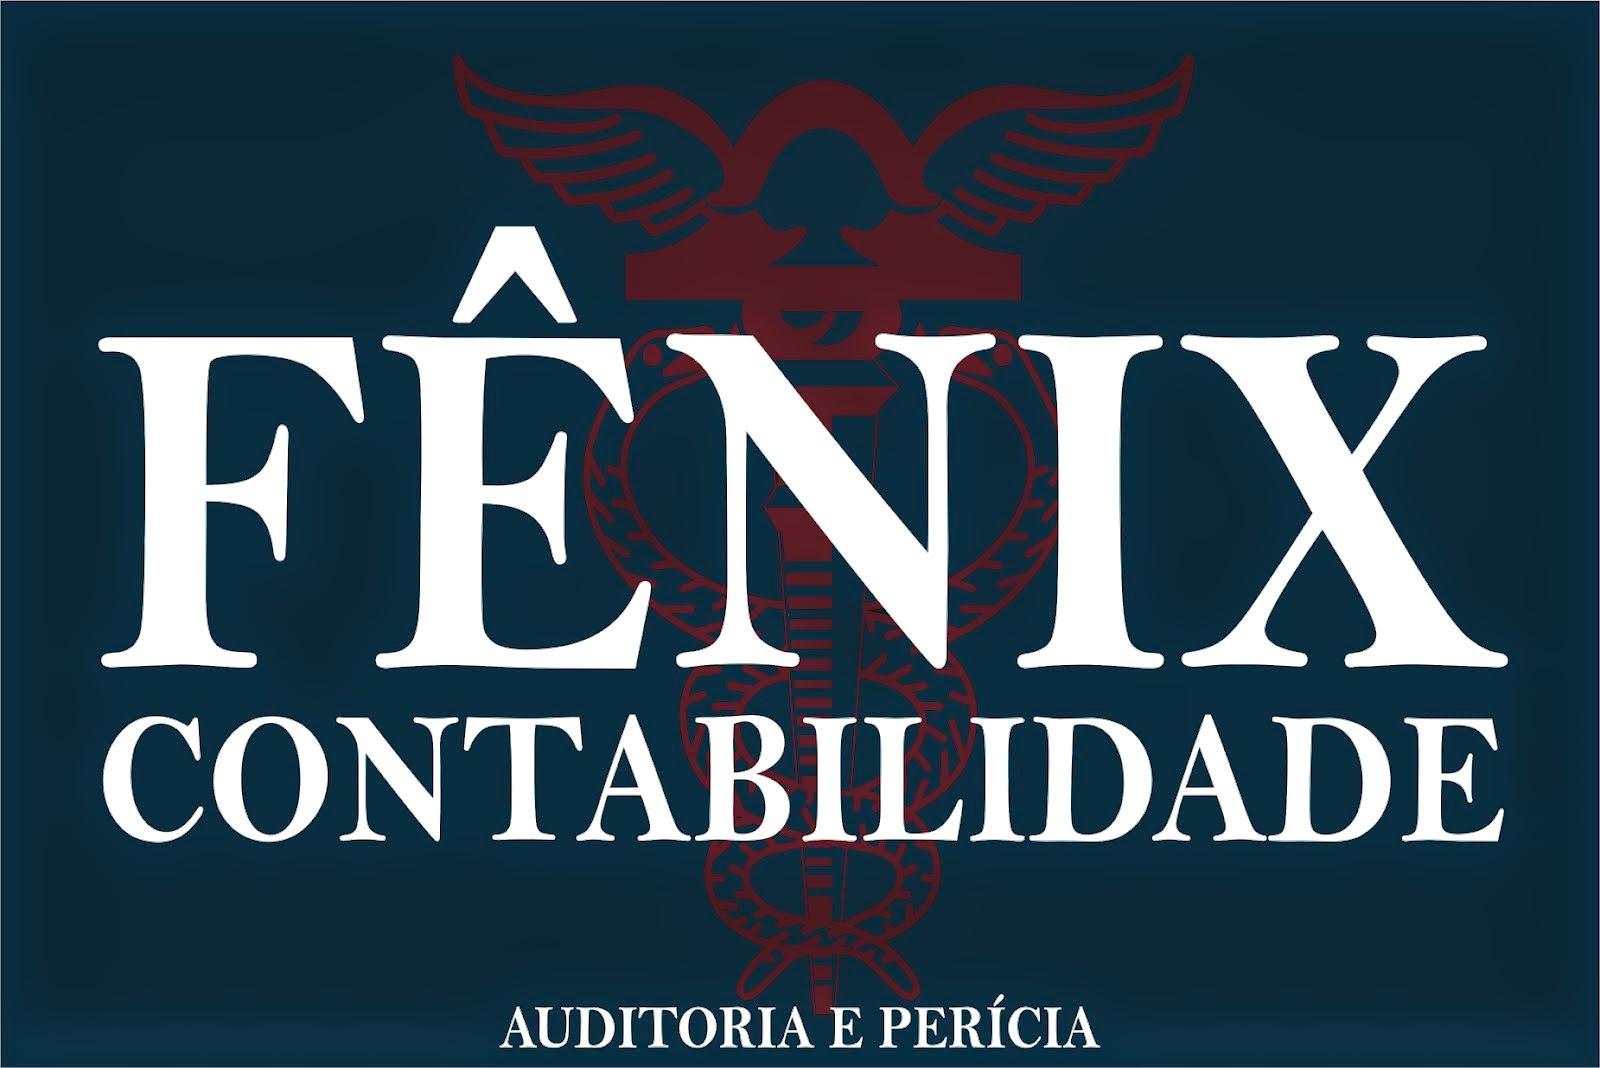 FENIX CONTABILIDADE